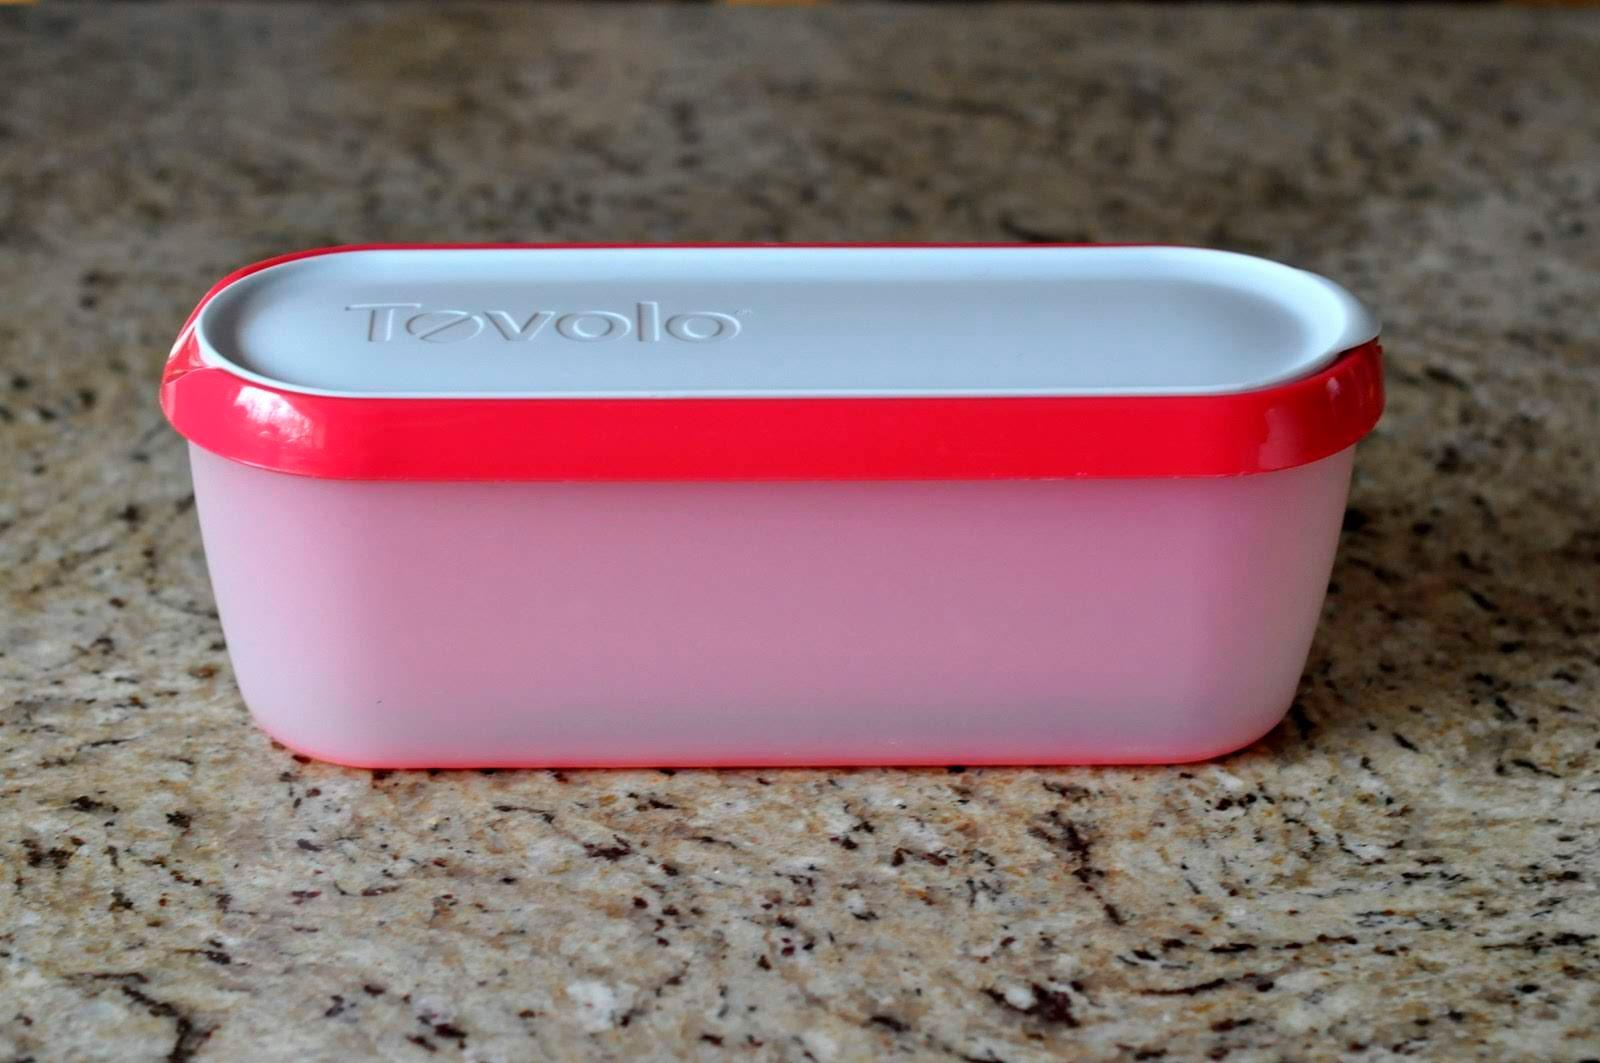 Tovolo Glide-A-Scoop Ice Cream Tub   Taste As You Go